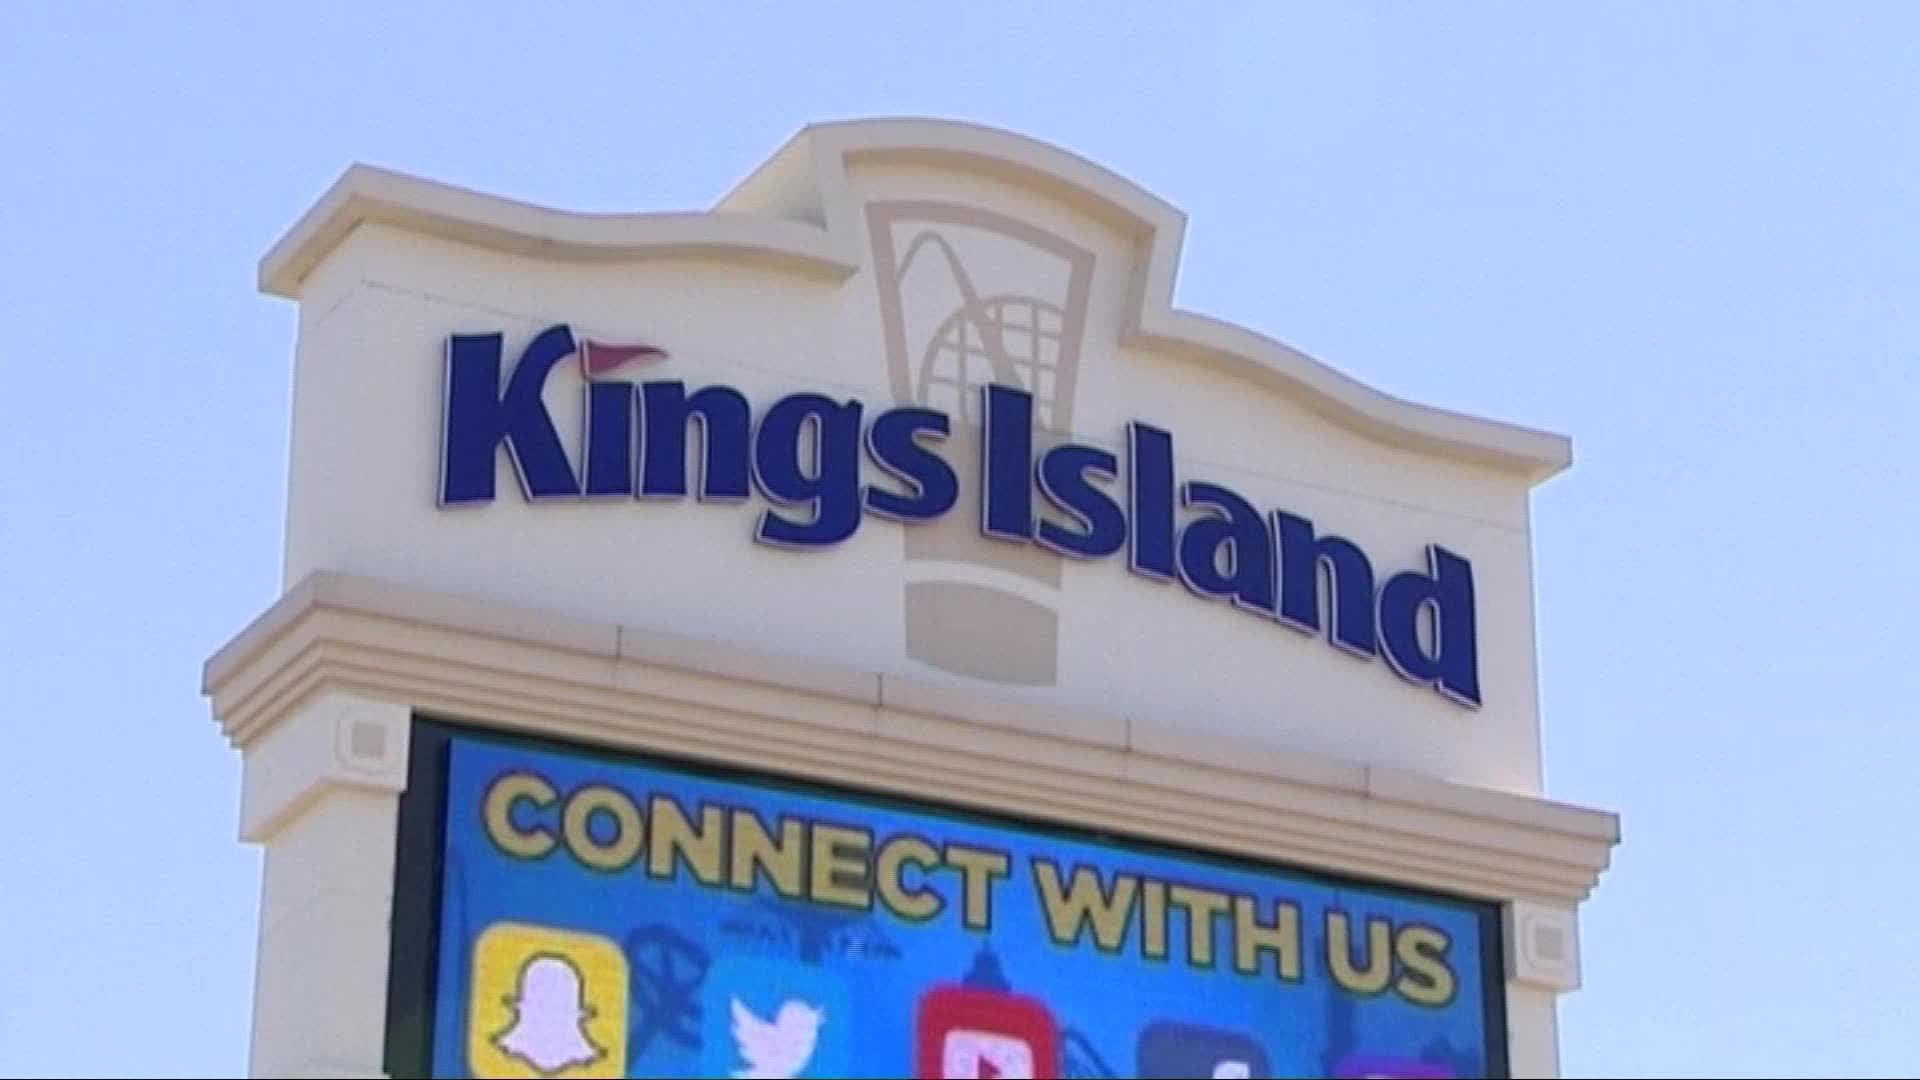 Kings_Island_offering_teachers_free_admi_0_20180820155657